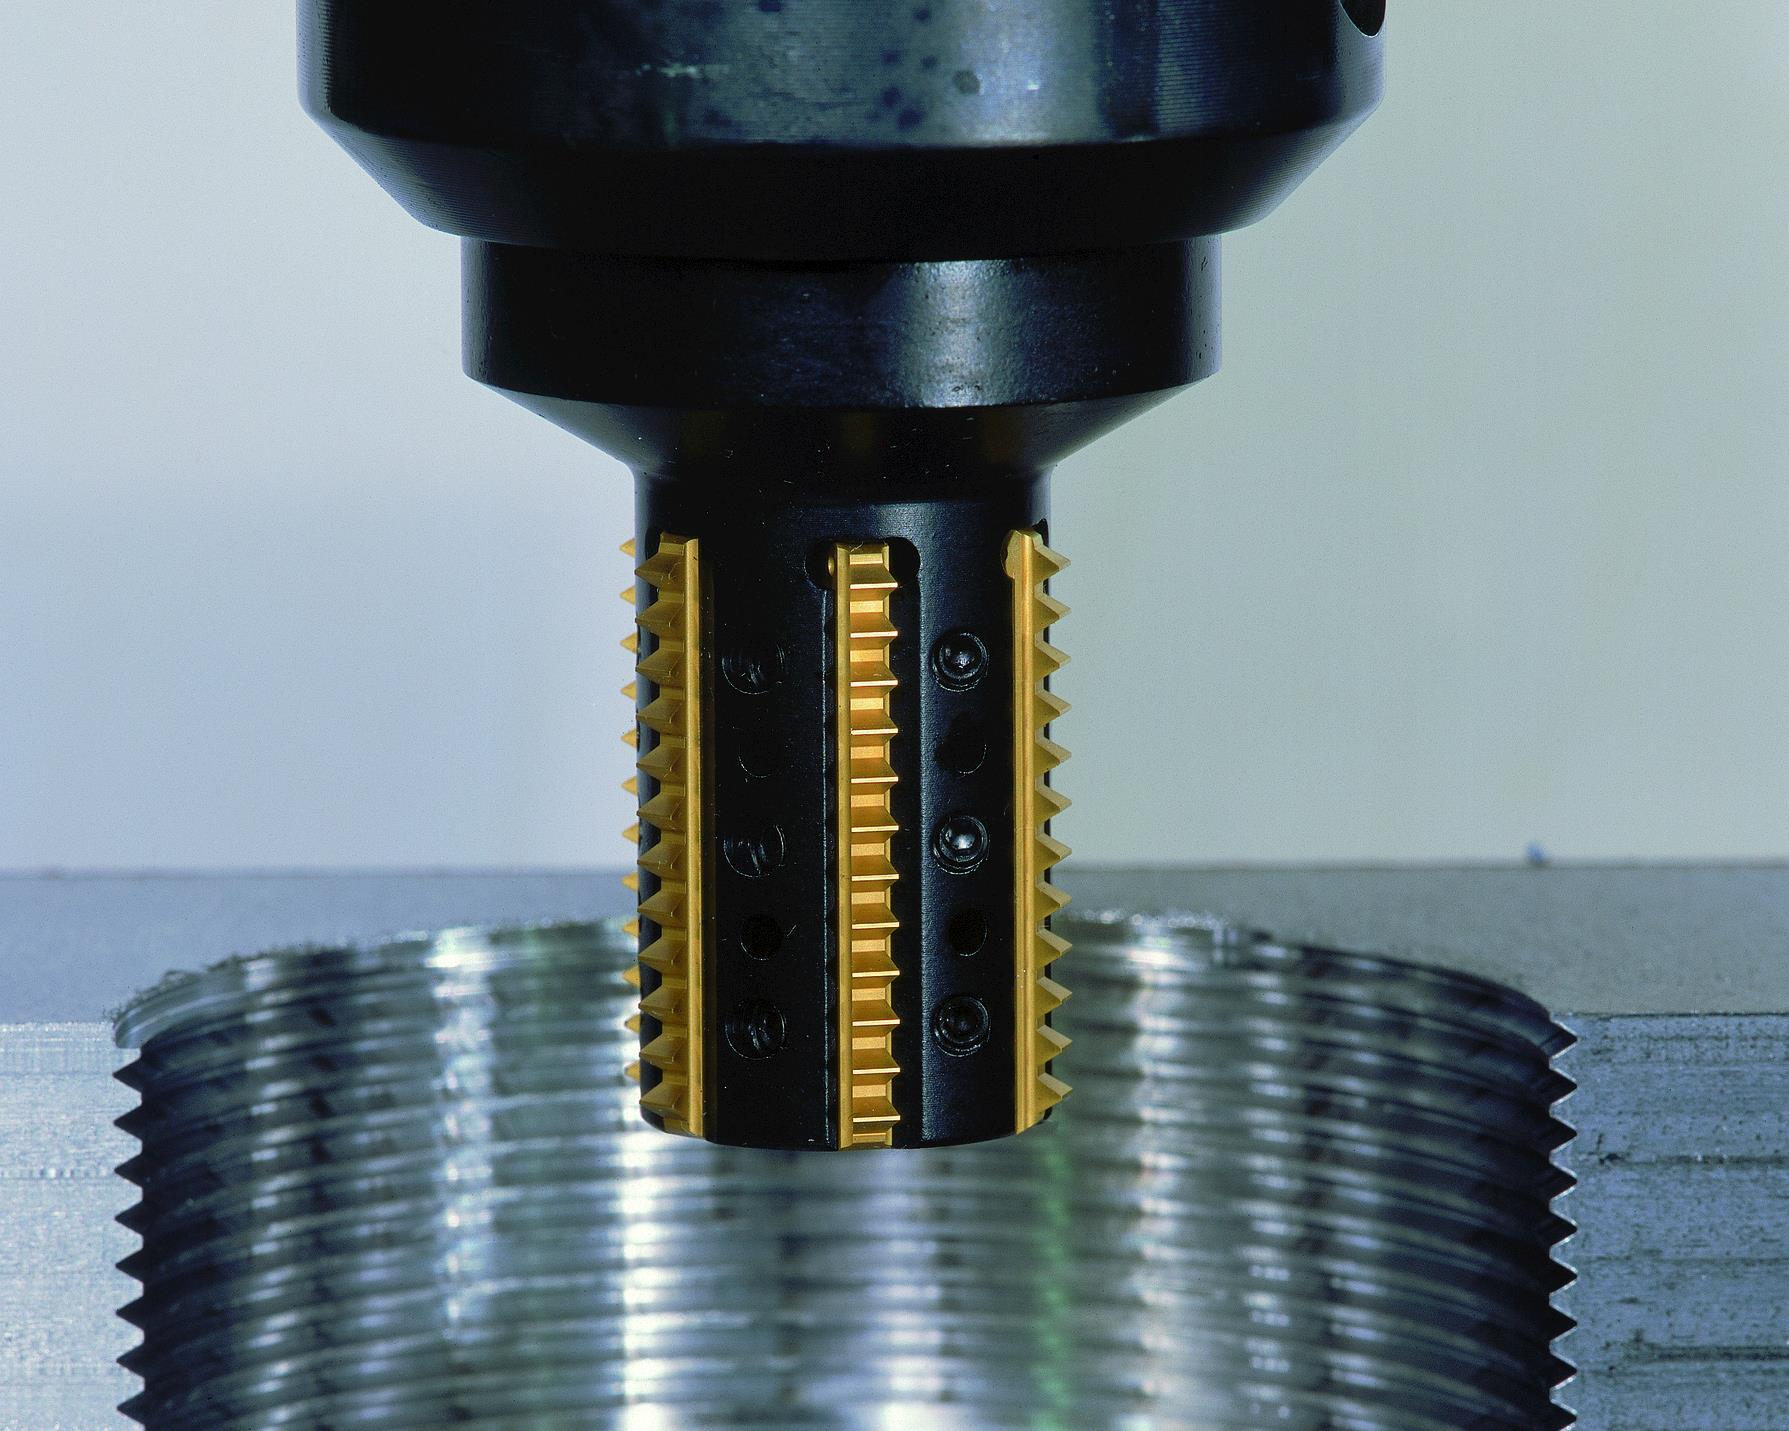 396.18/19/20 - Insert Thread Milling Cutters